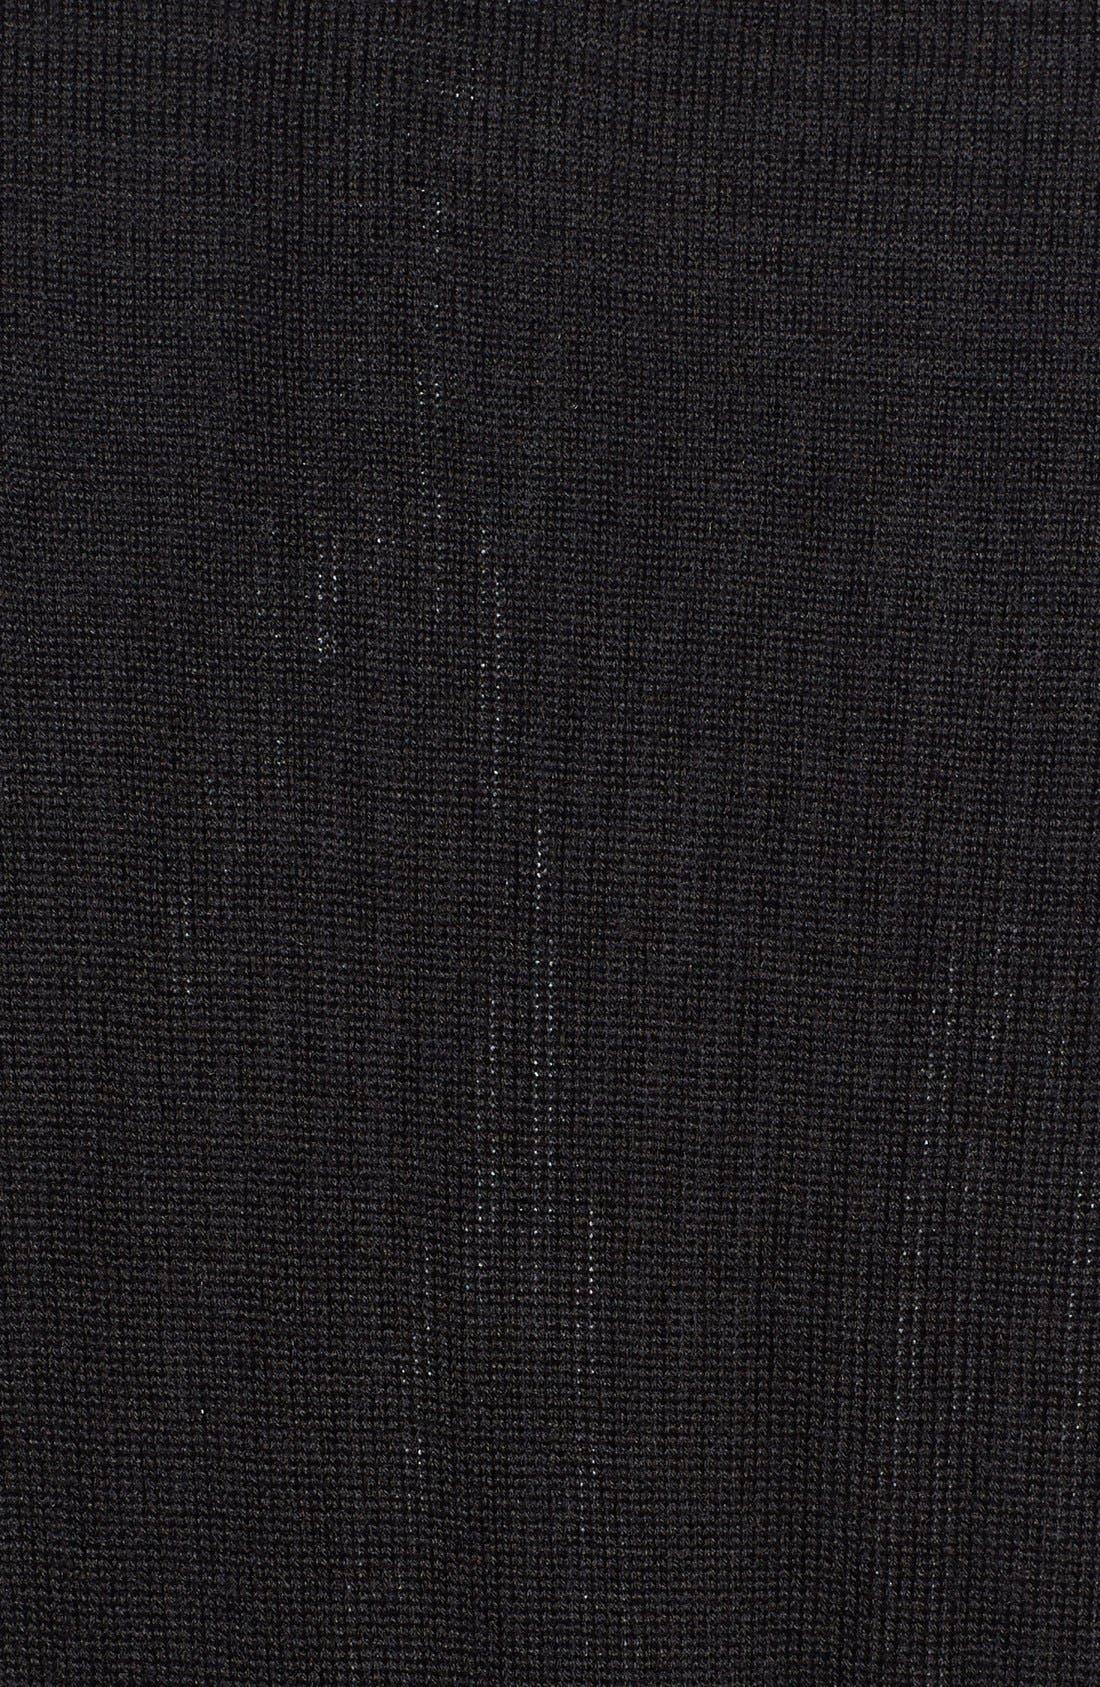 Alternate Image 2  - Cutter & Buck 'Douglas' Merino Wool Blend V-Neck Sweater (Online Only)